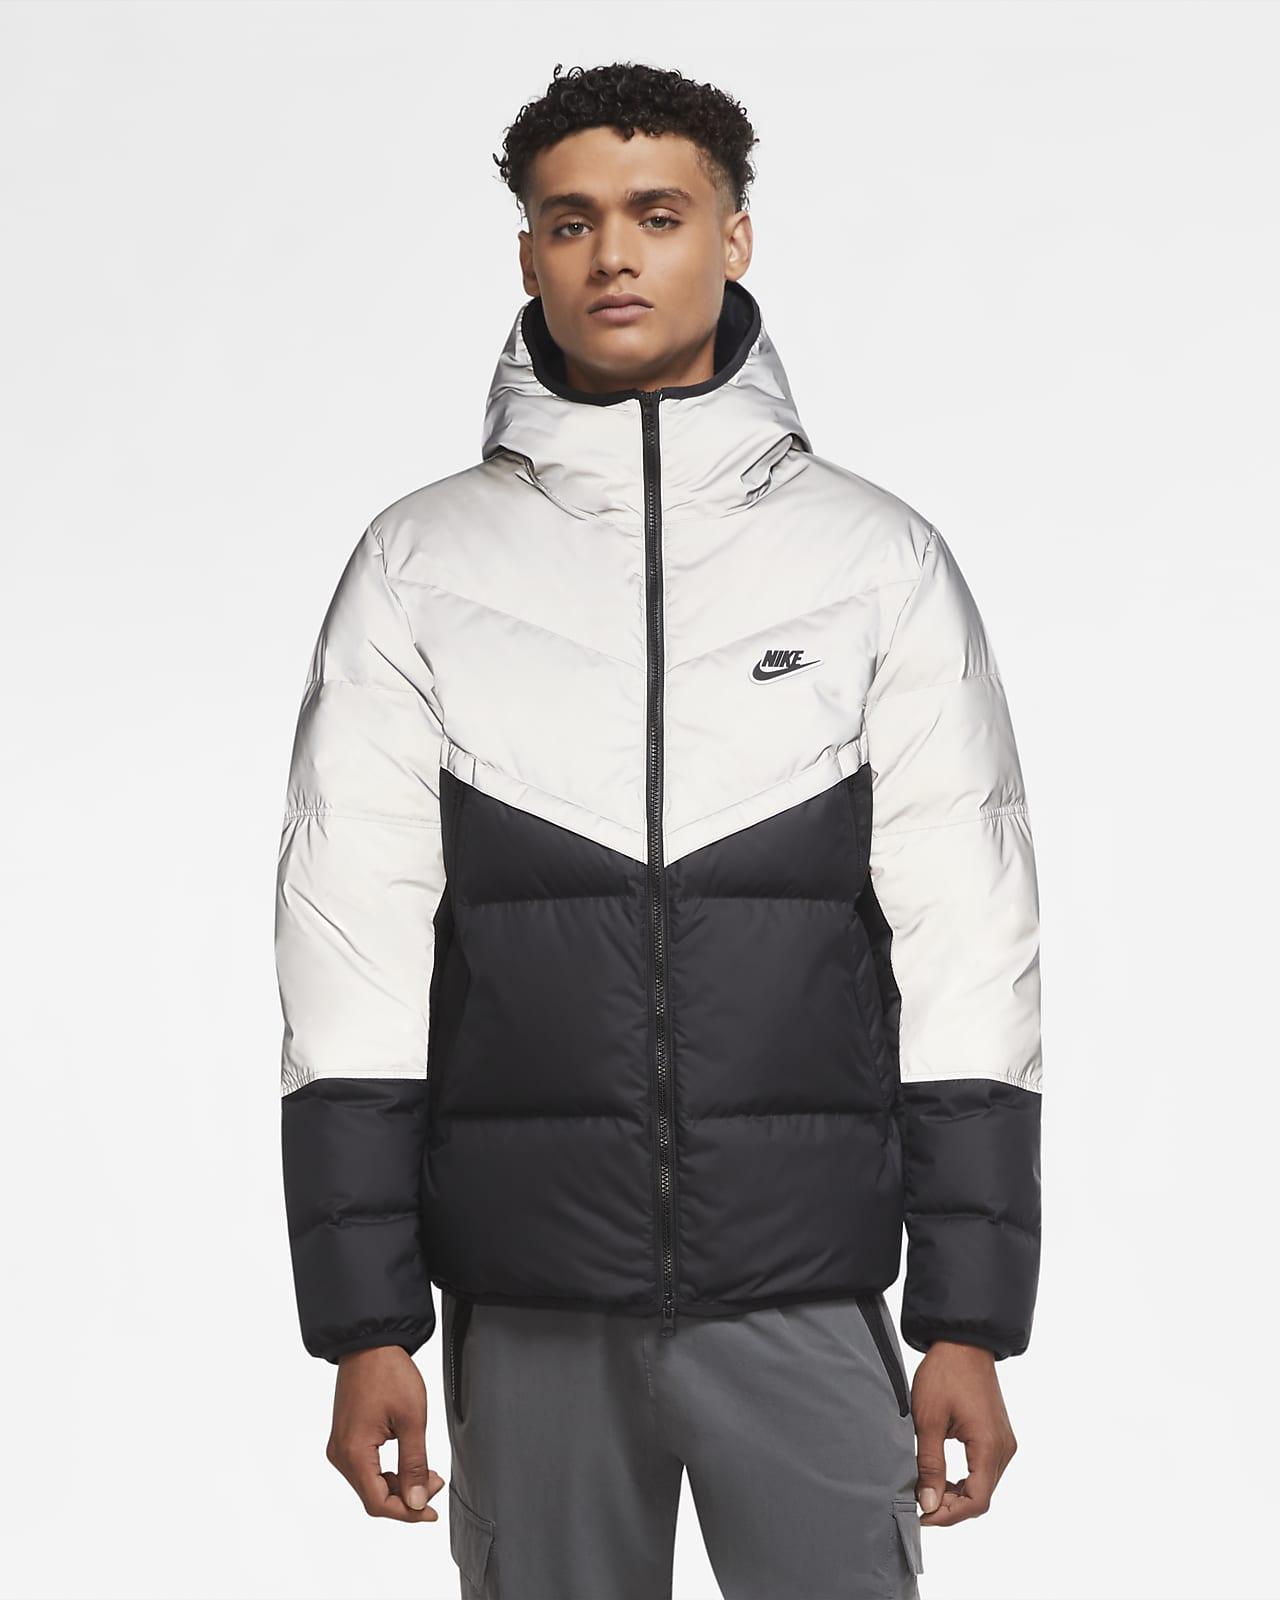 Asco Sencillez Pobreza extrema  Nike Sportswear Down-Fill Windrunner Chaqueta con tecnología Nike Shield -  Hombre. Nike ES